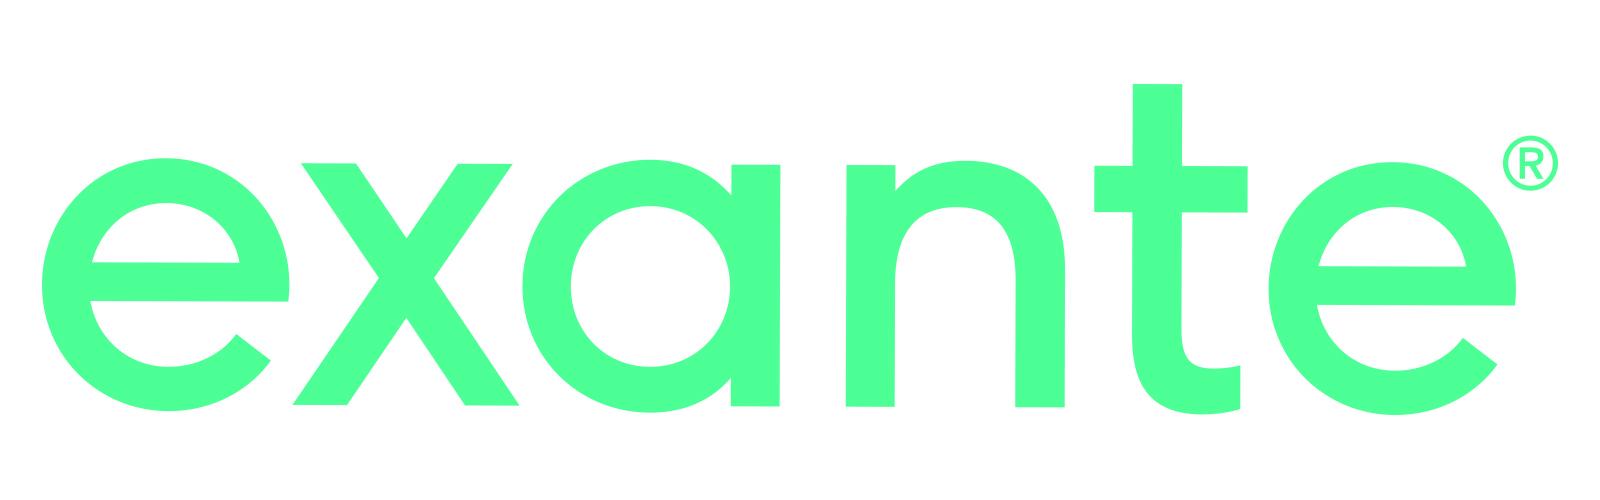 exantediet-uk-logo